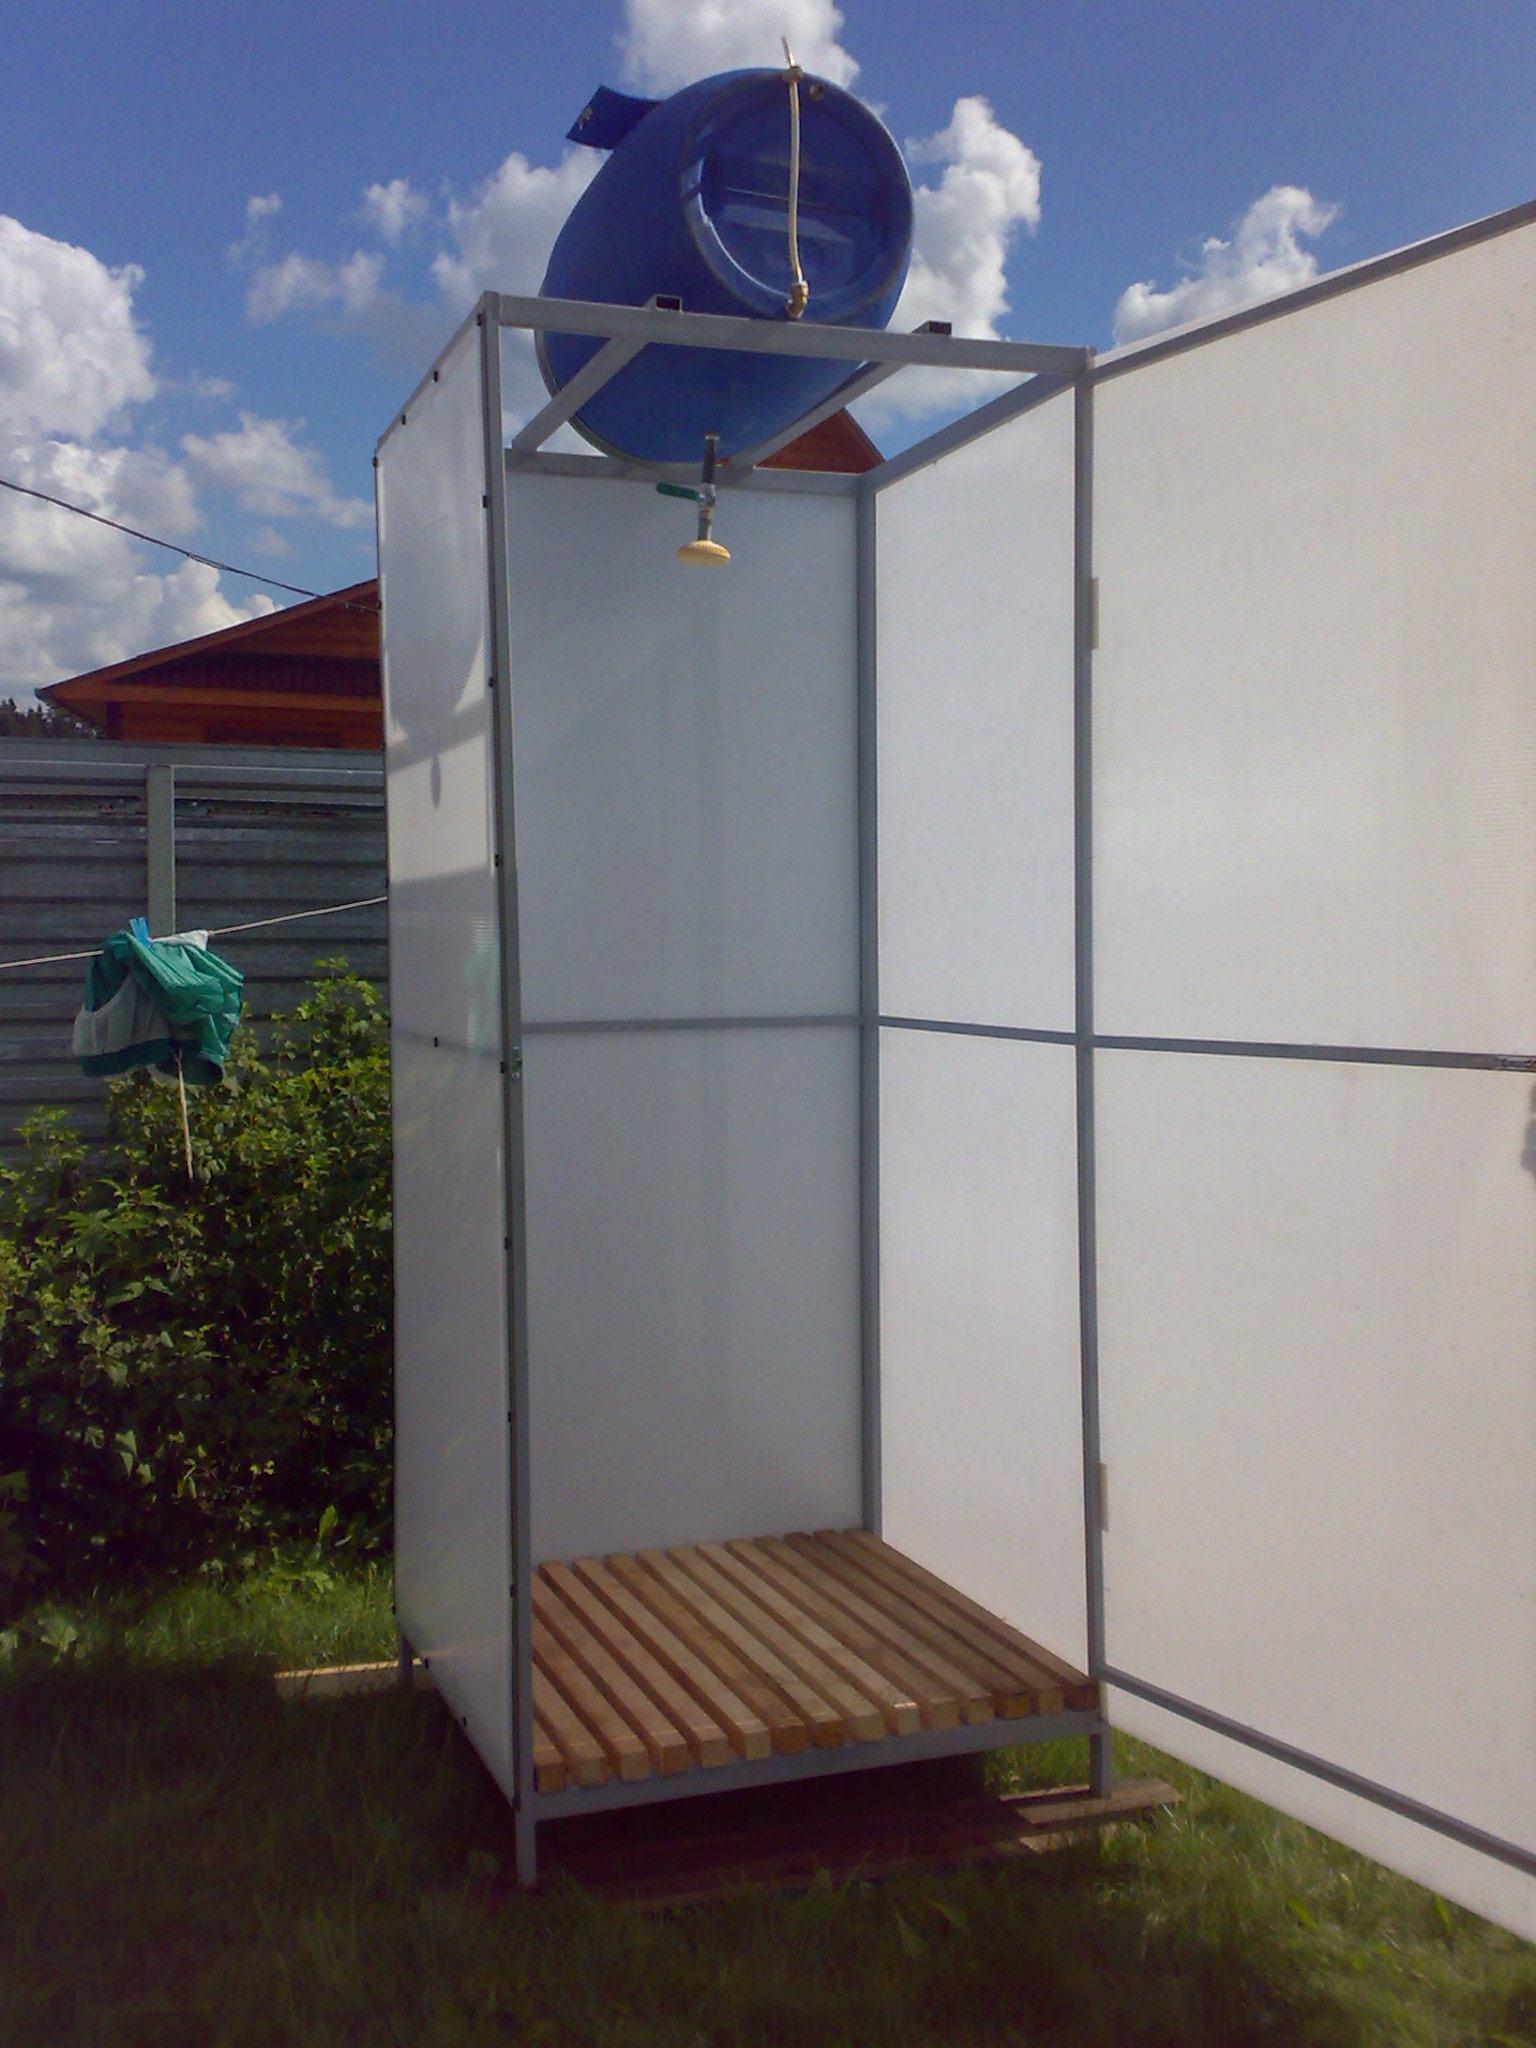 Летний душ своими руками из поликарбоната своими руками